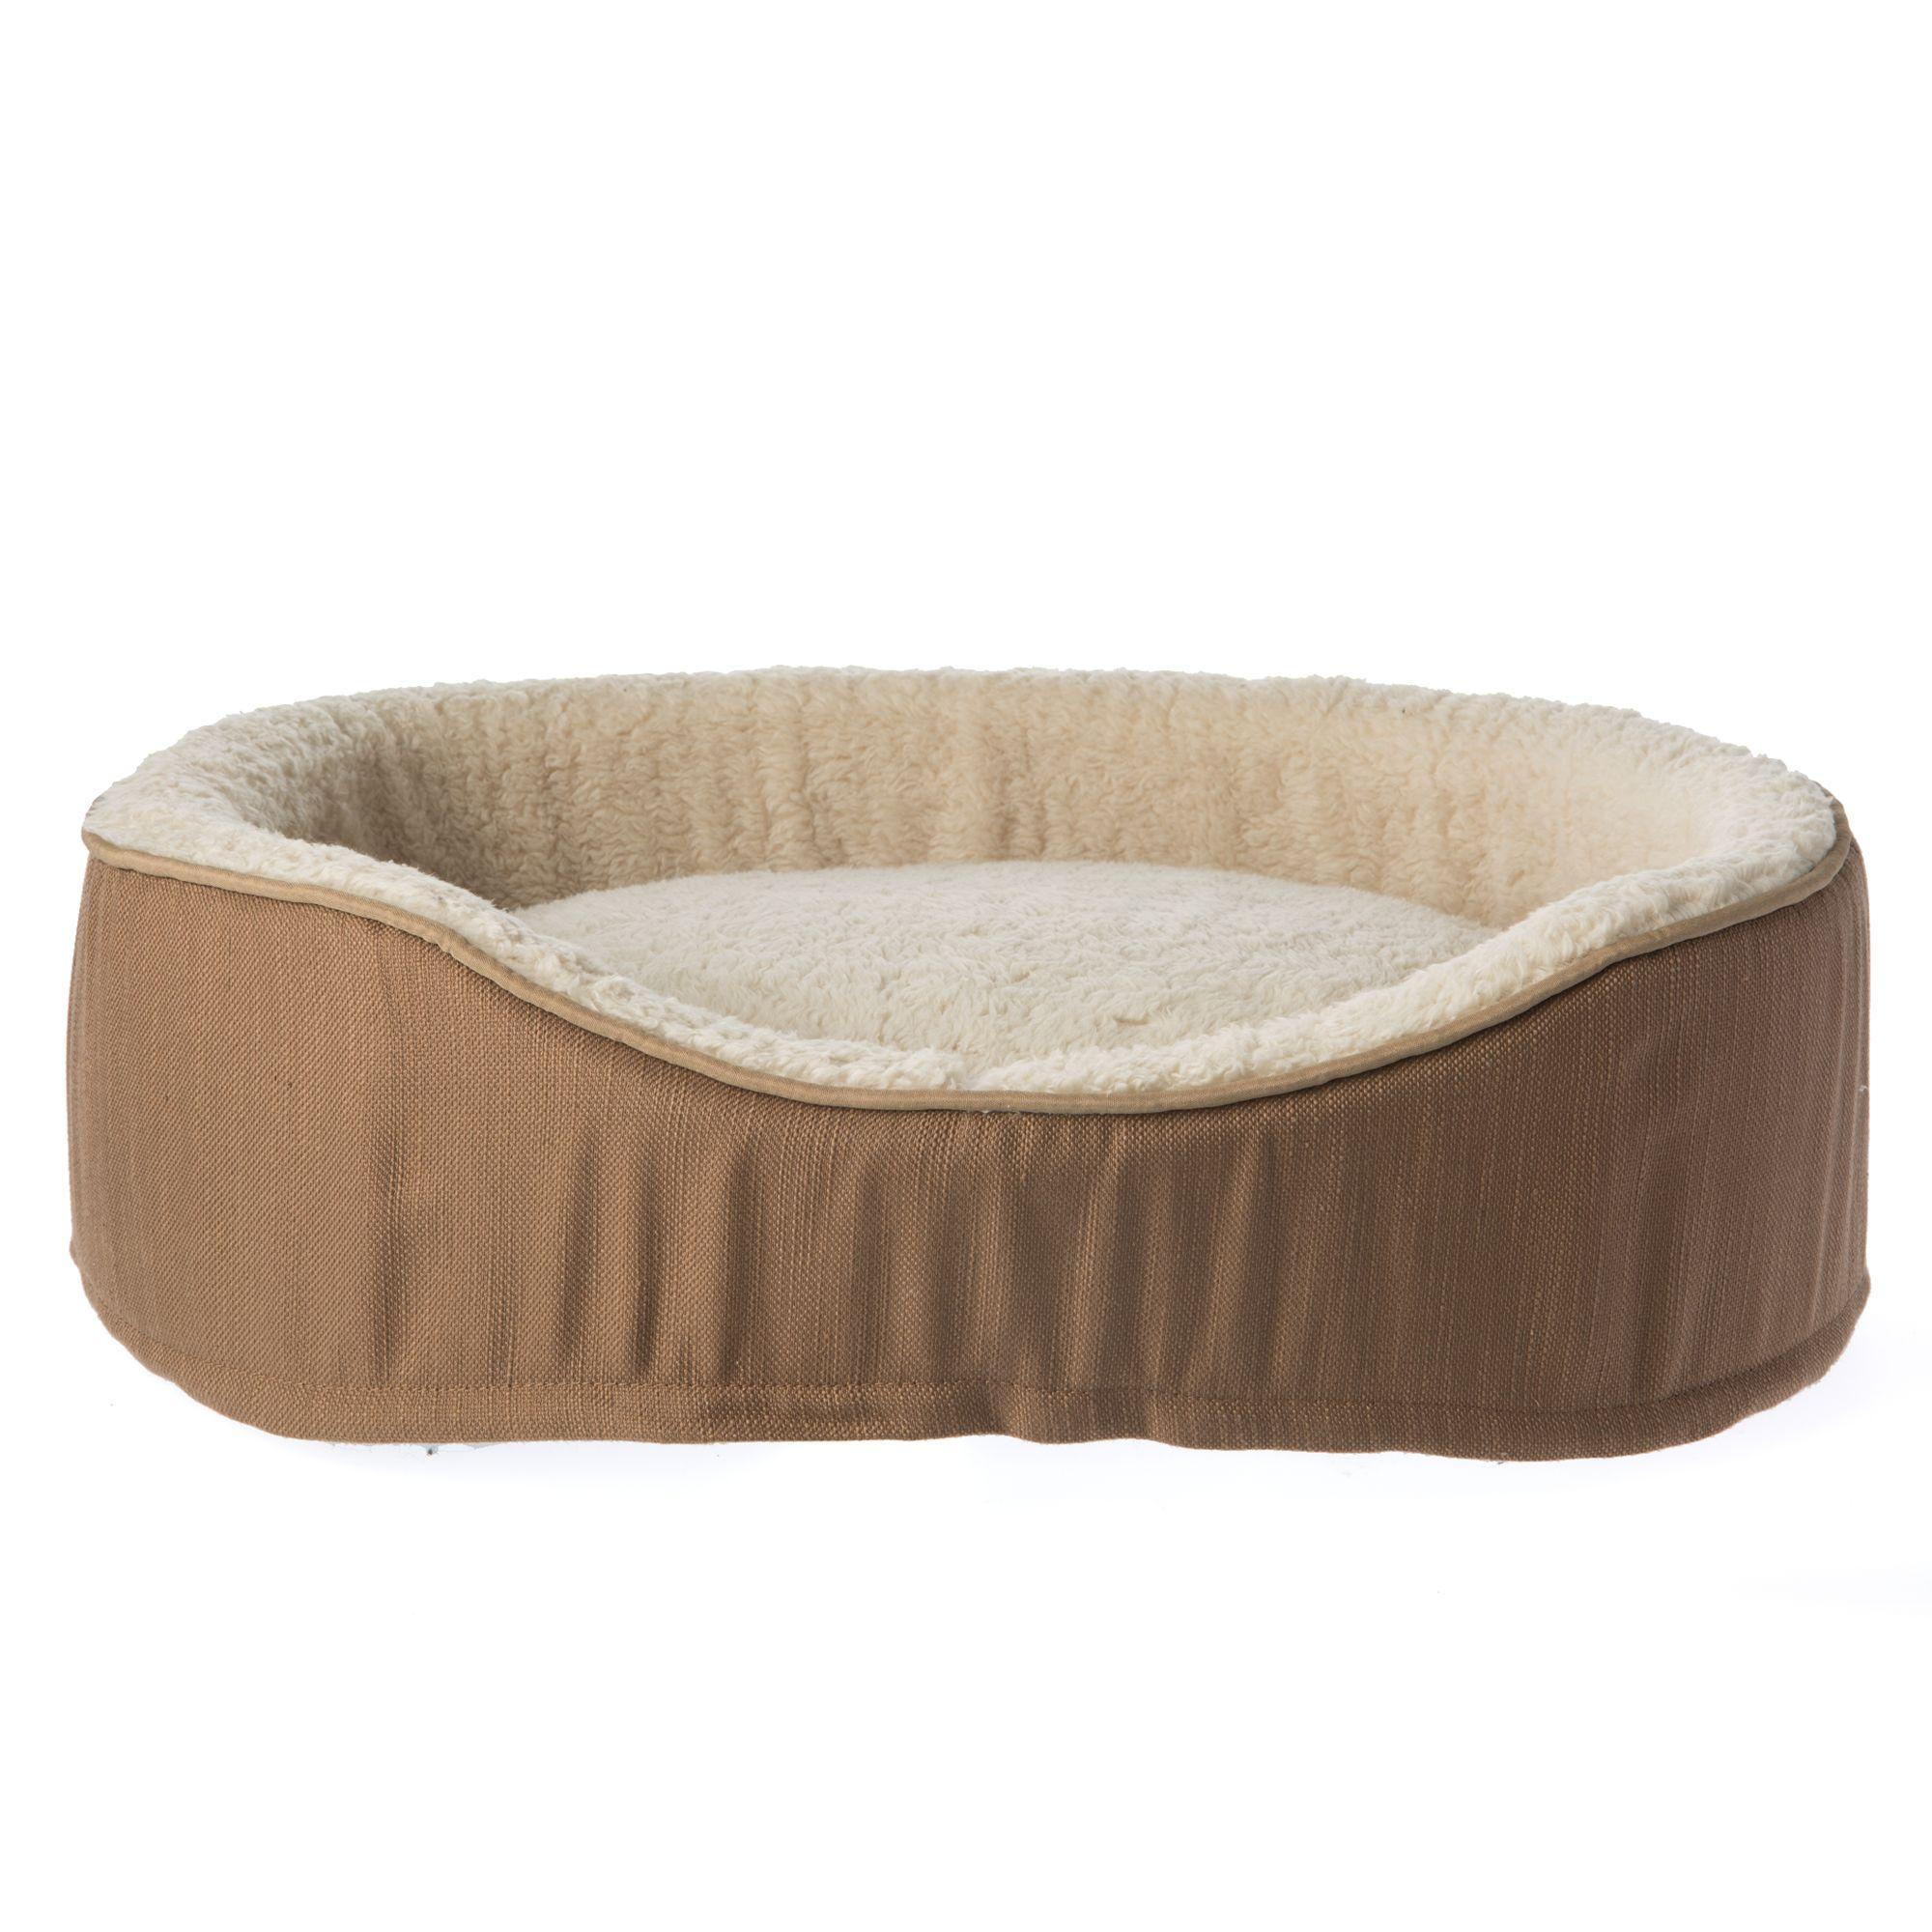 Top Paw 174 Orthopedic Memory Foam Cuddler Dog Bed